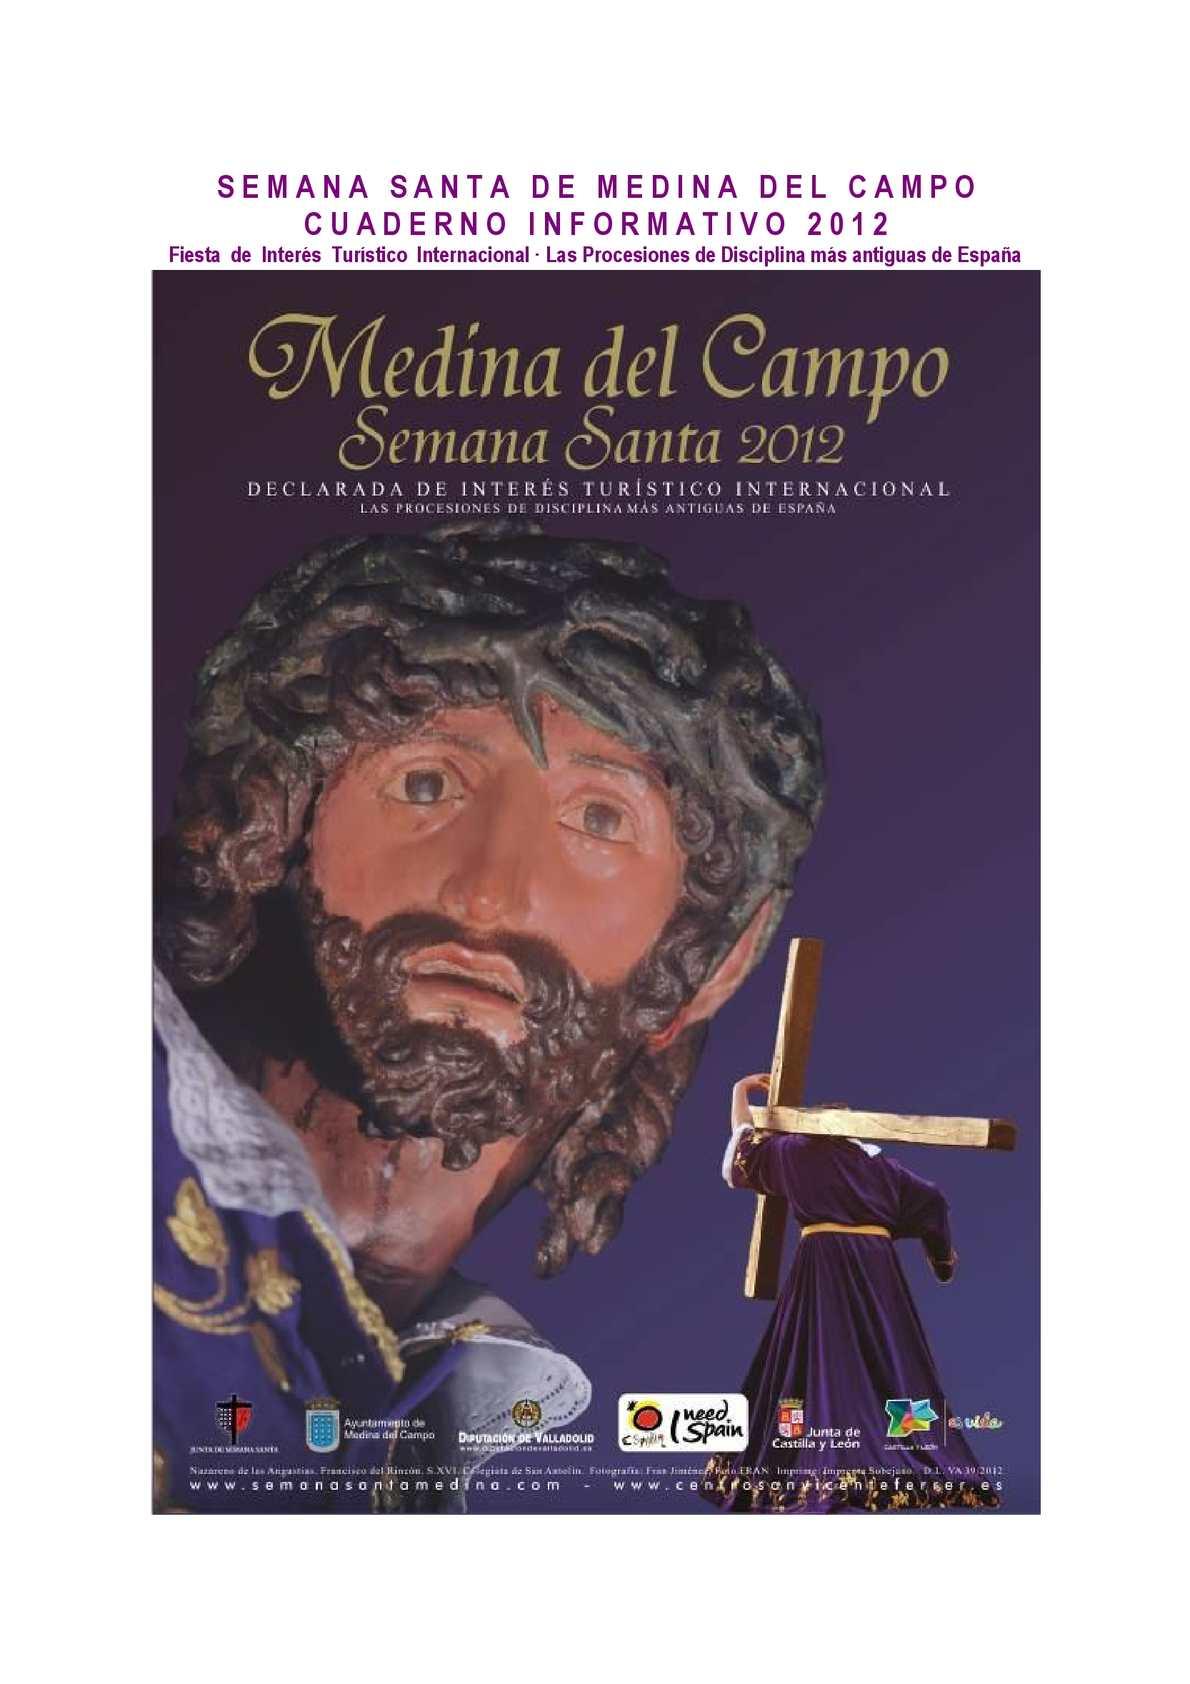 Calam O Medina Del Campo Cuaderno De Prensa Semana Santa 2012  # Muebles Cesteros Alaejos